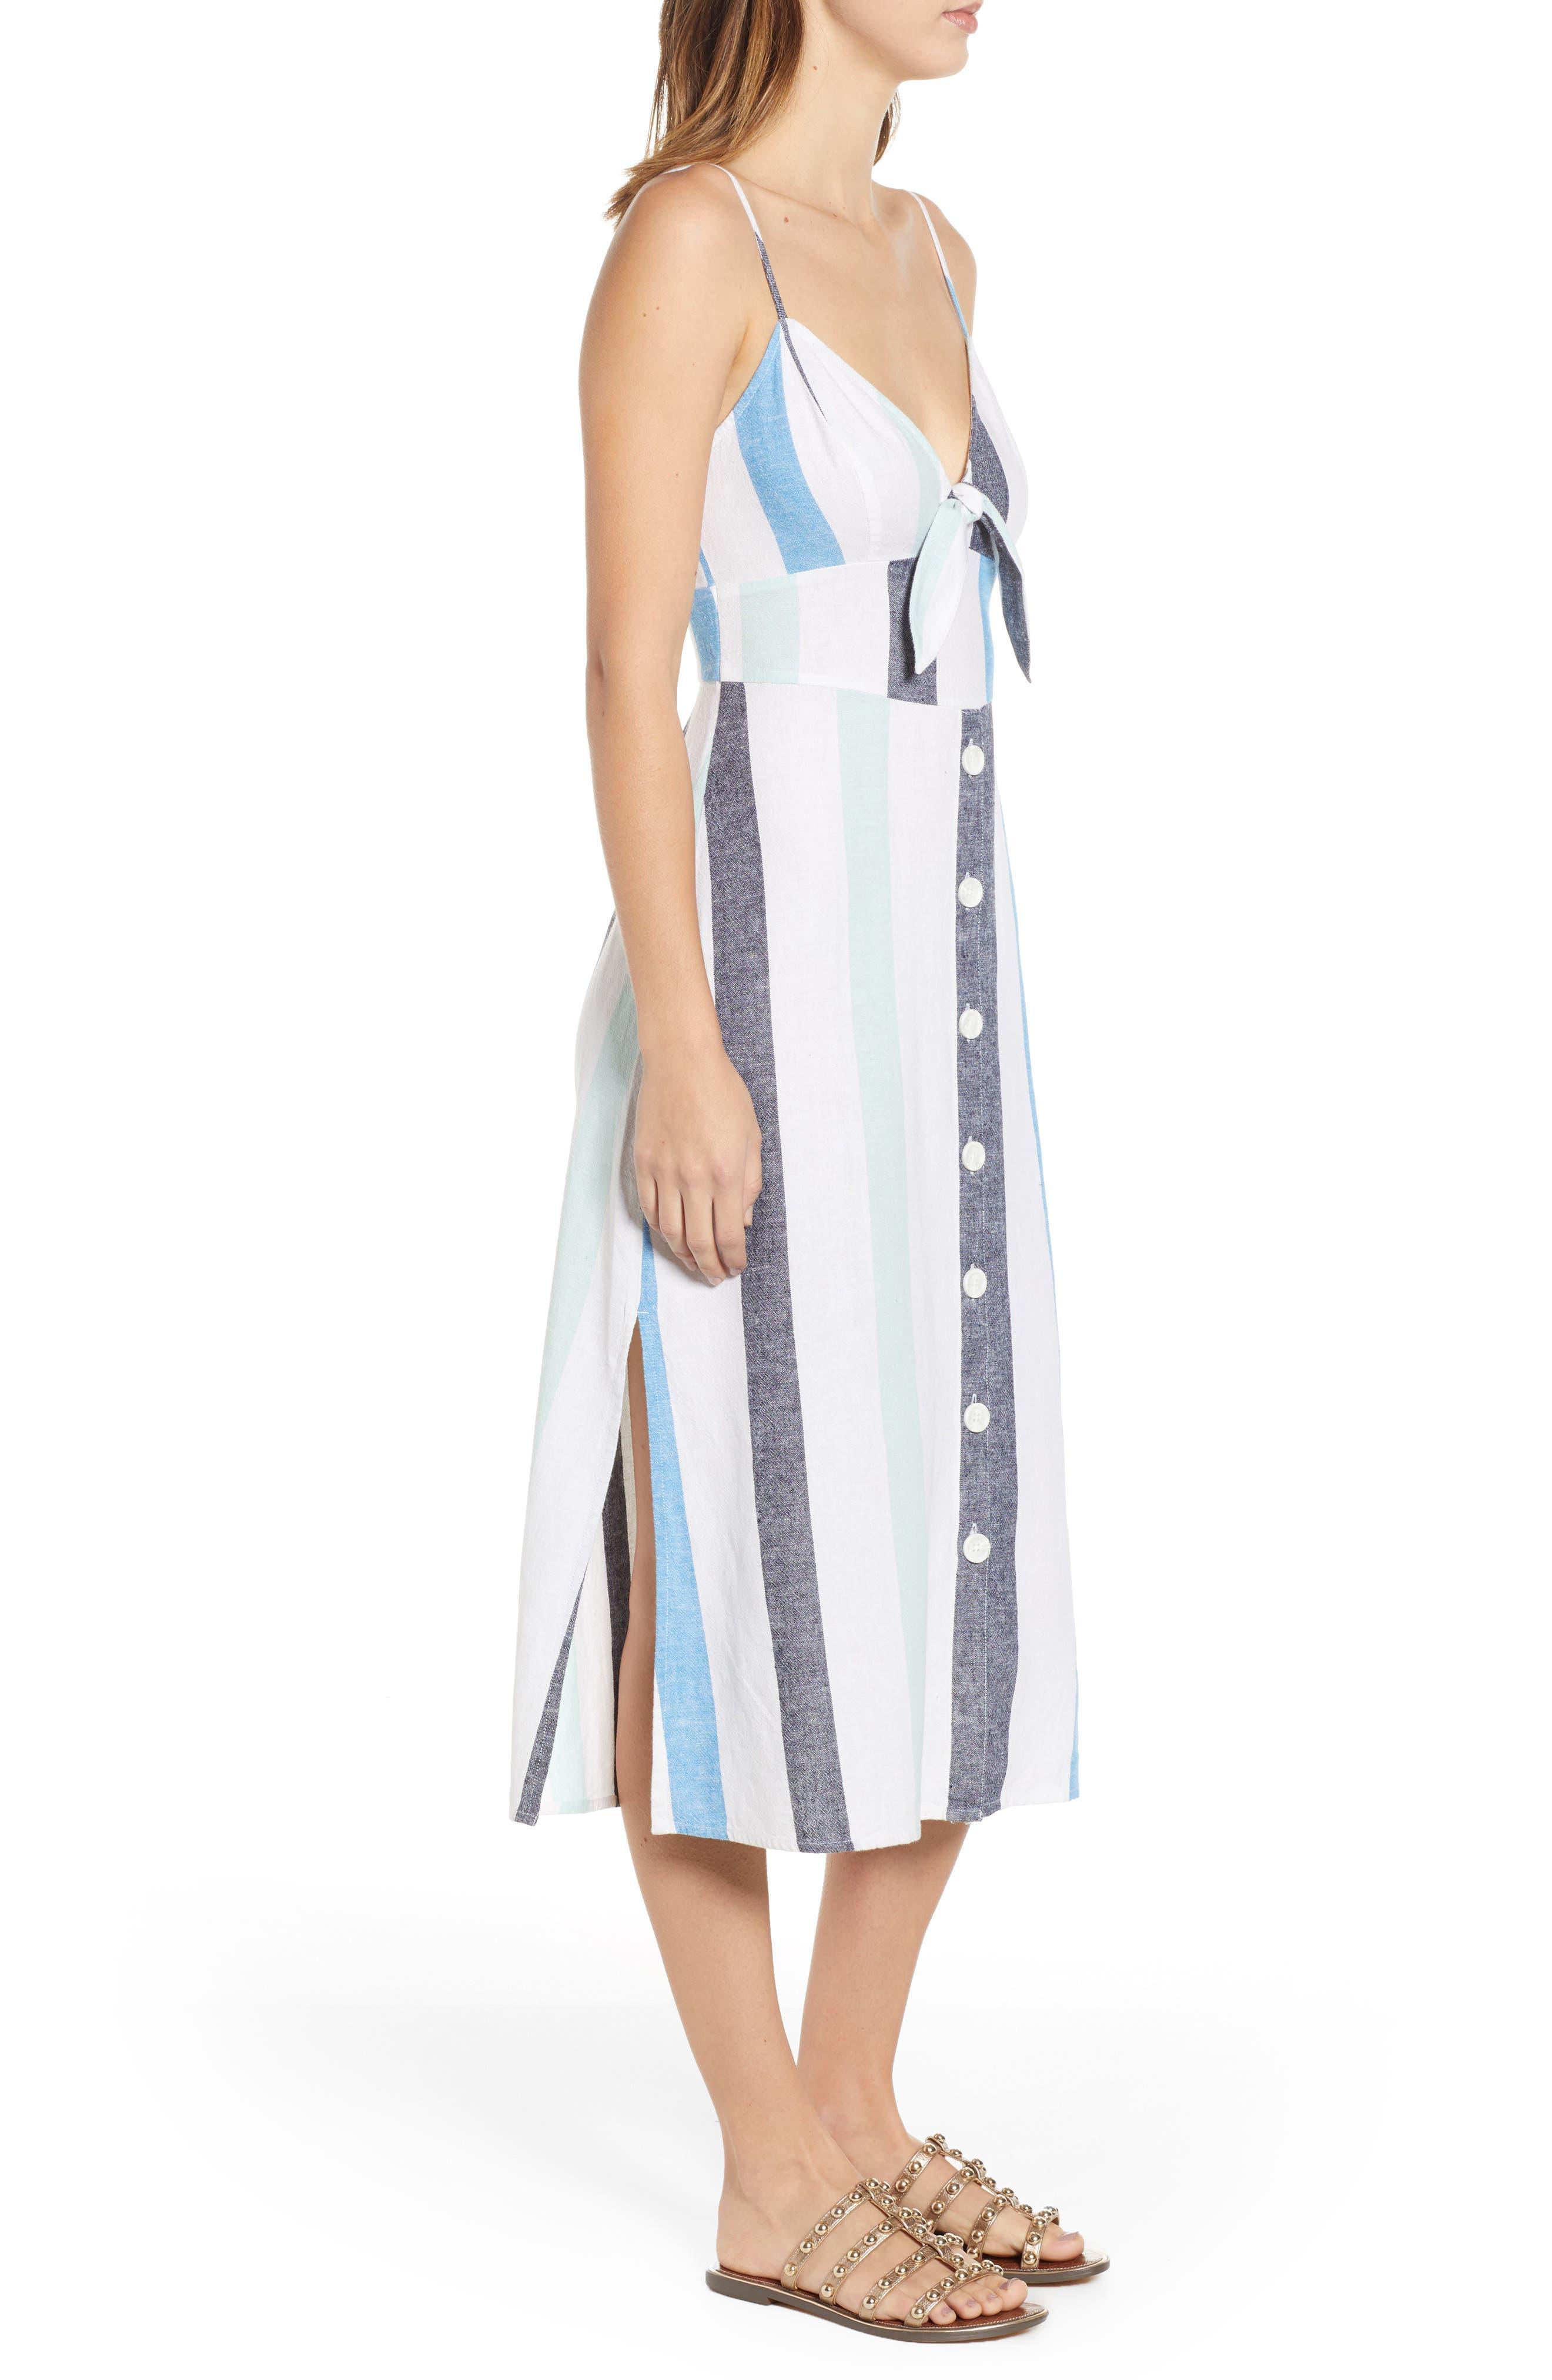 BP., Stripe Sundress, Alternate thumbnail 5, color, BLUE PLACID LACY STRIPE